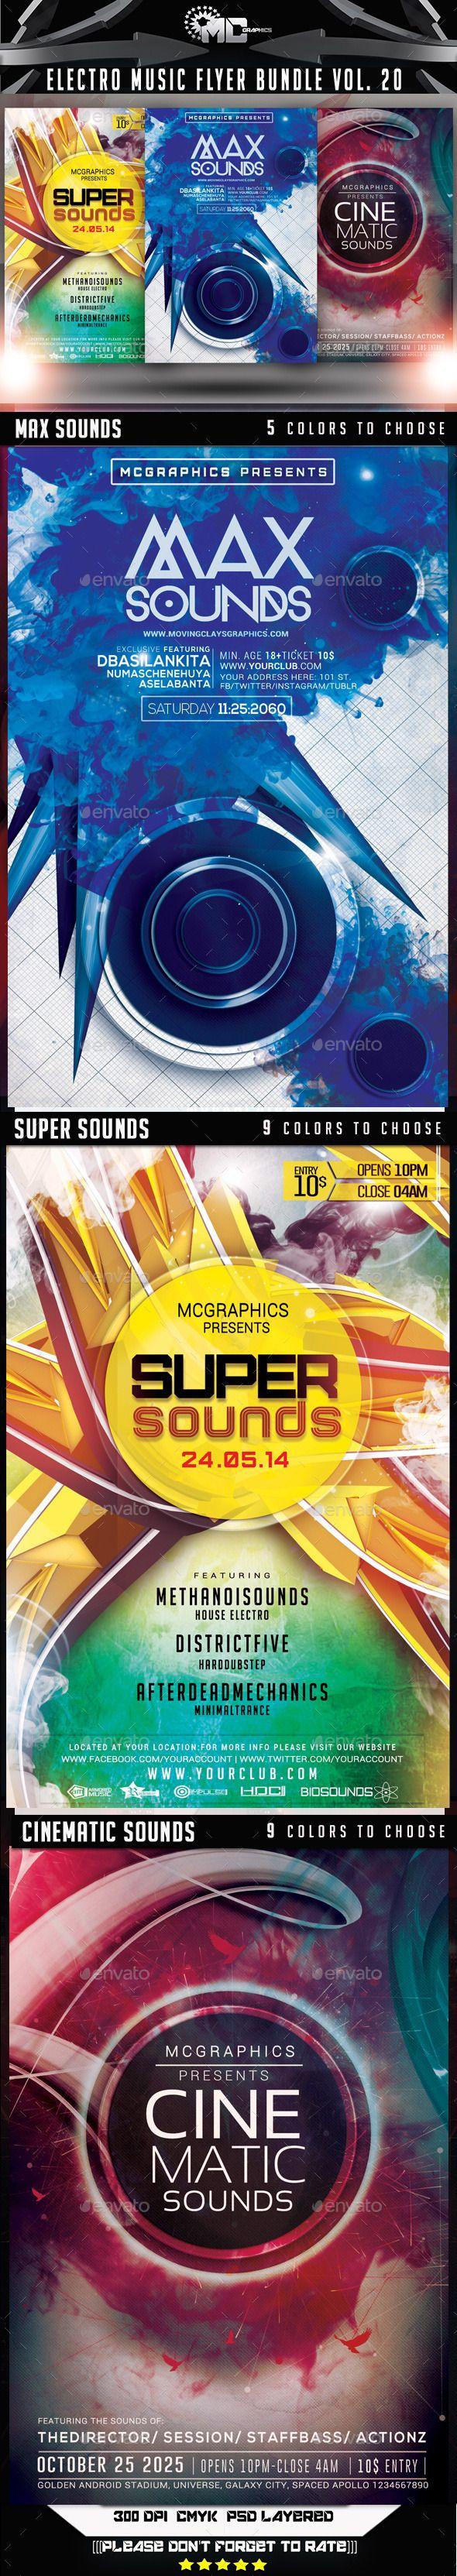 Electro Music Flyer Bundle Vol. 20